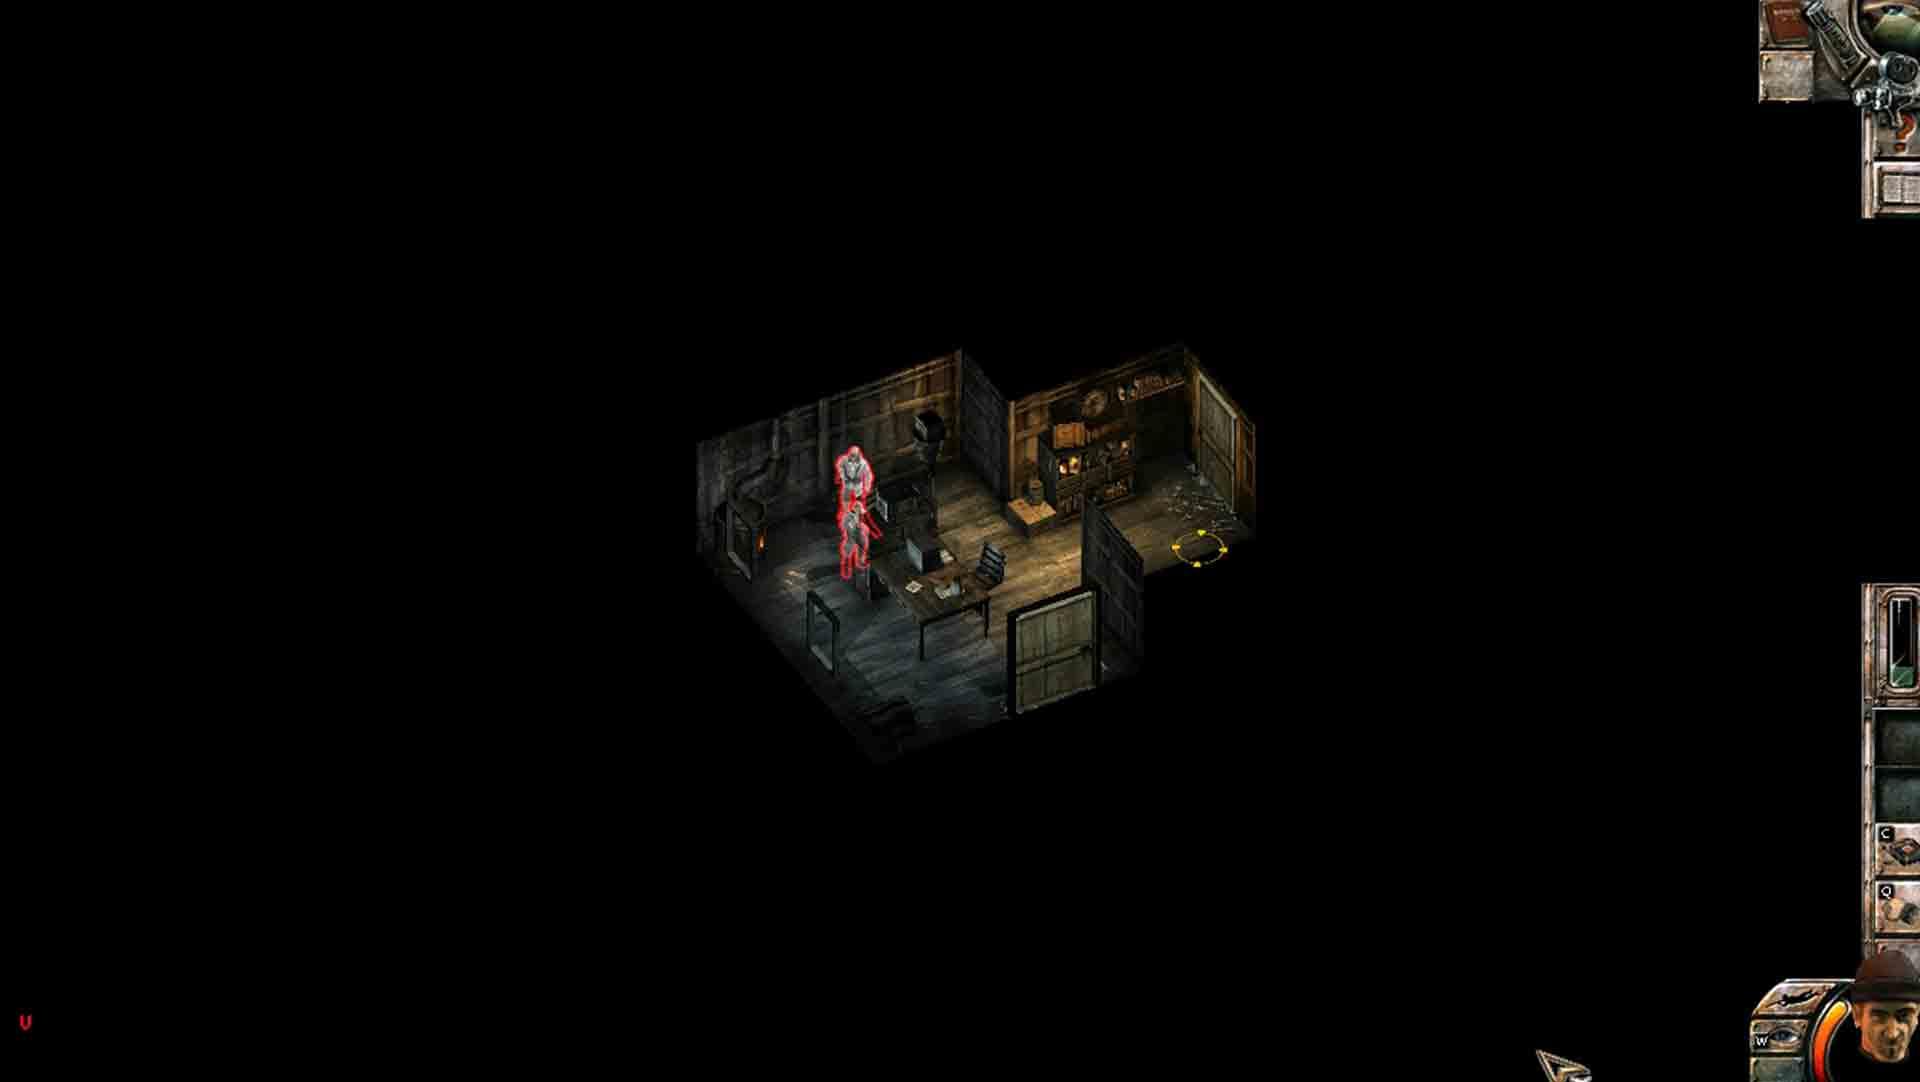 Commandos 2: Men of Courage game image